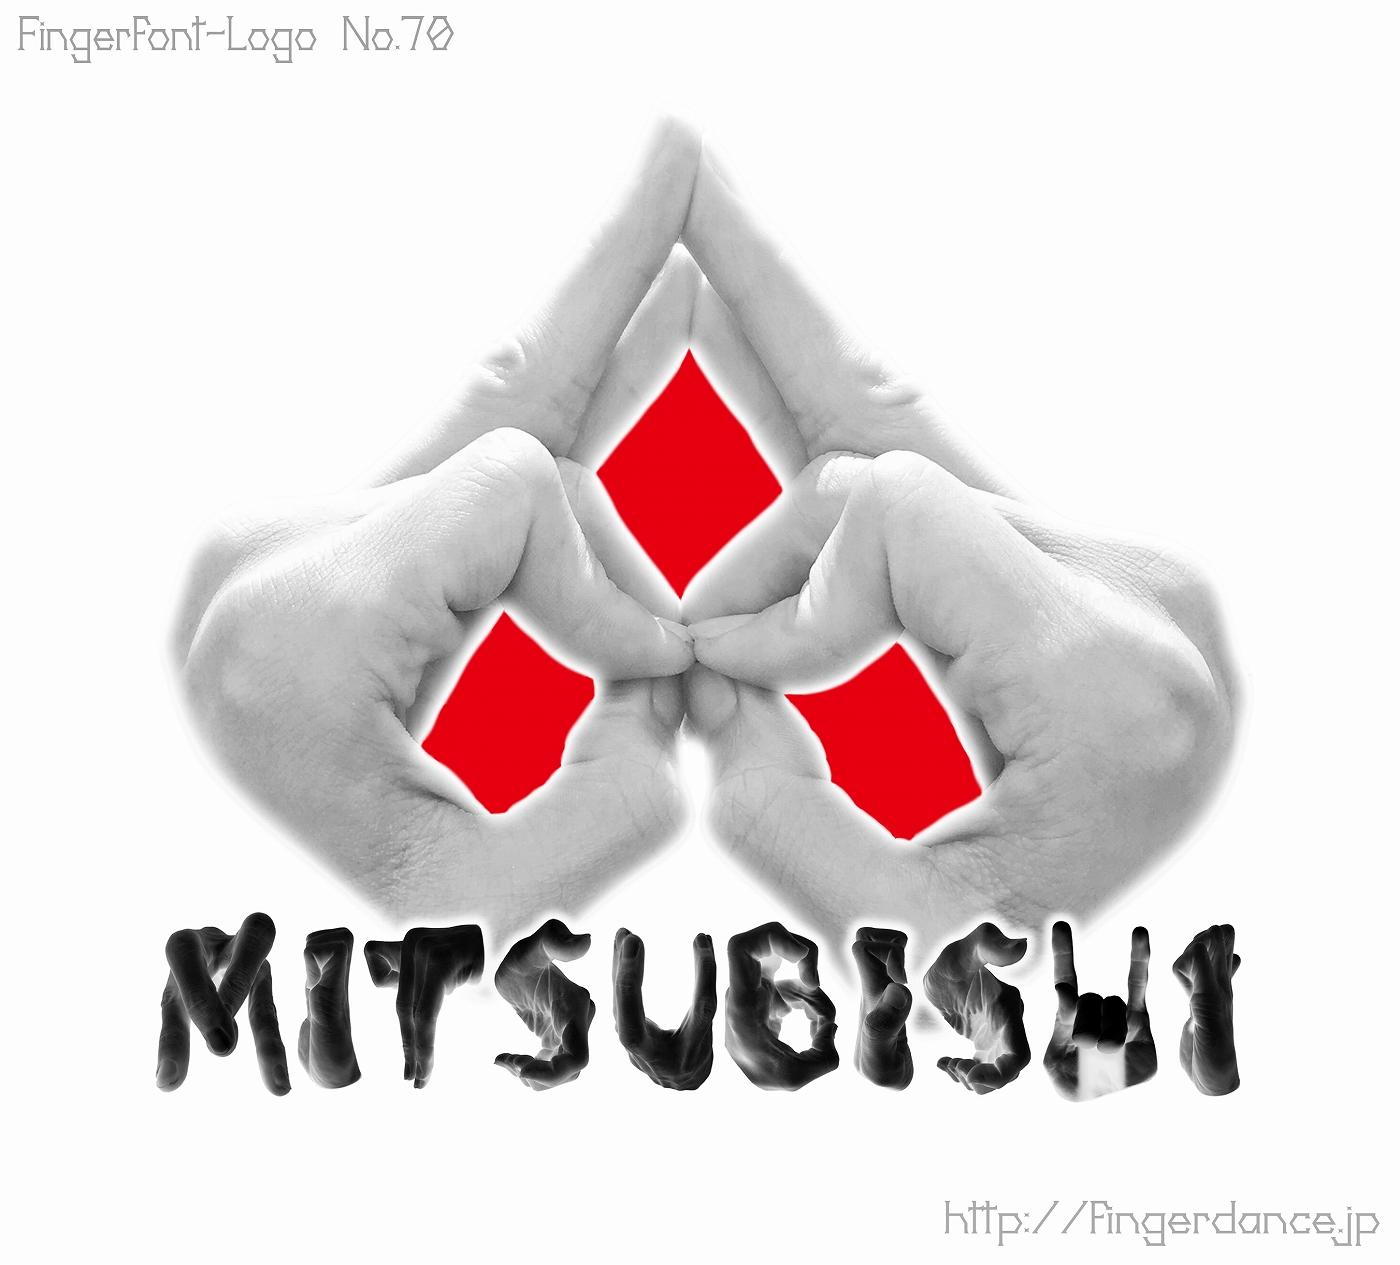 MITSUBISHI-fingerhttp://fingerdance.jp/L/logohand ミツビシフィンガーロゴハンド手指